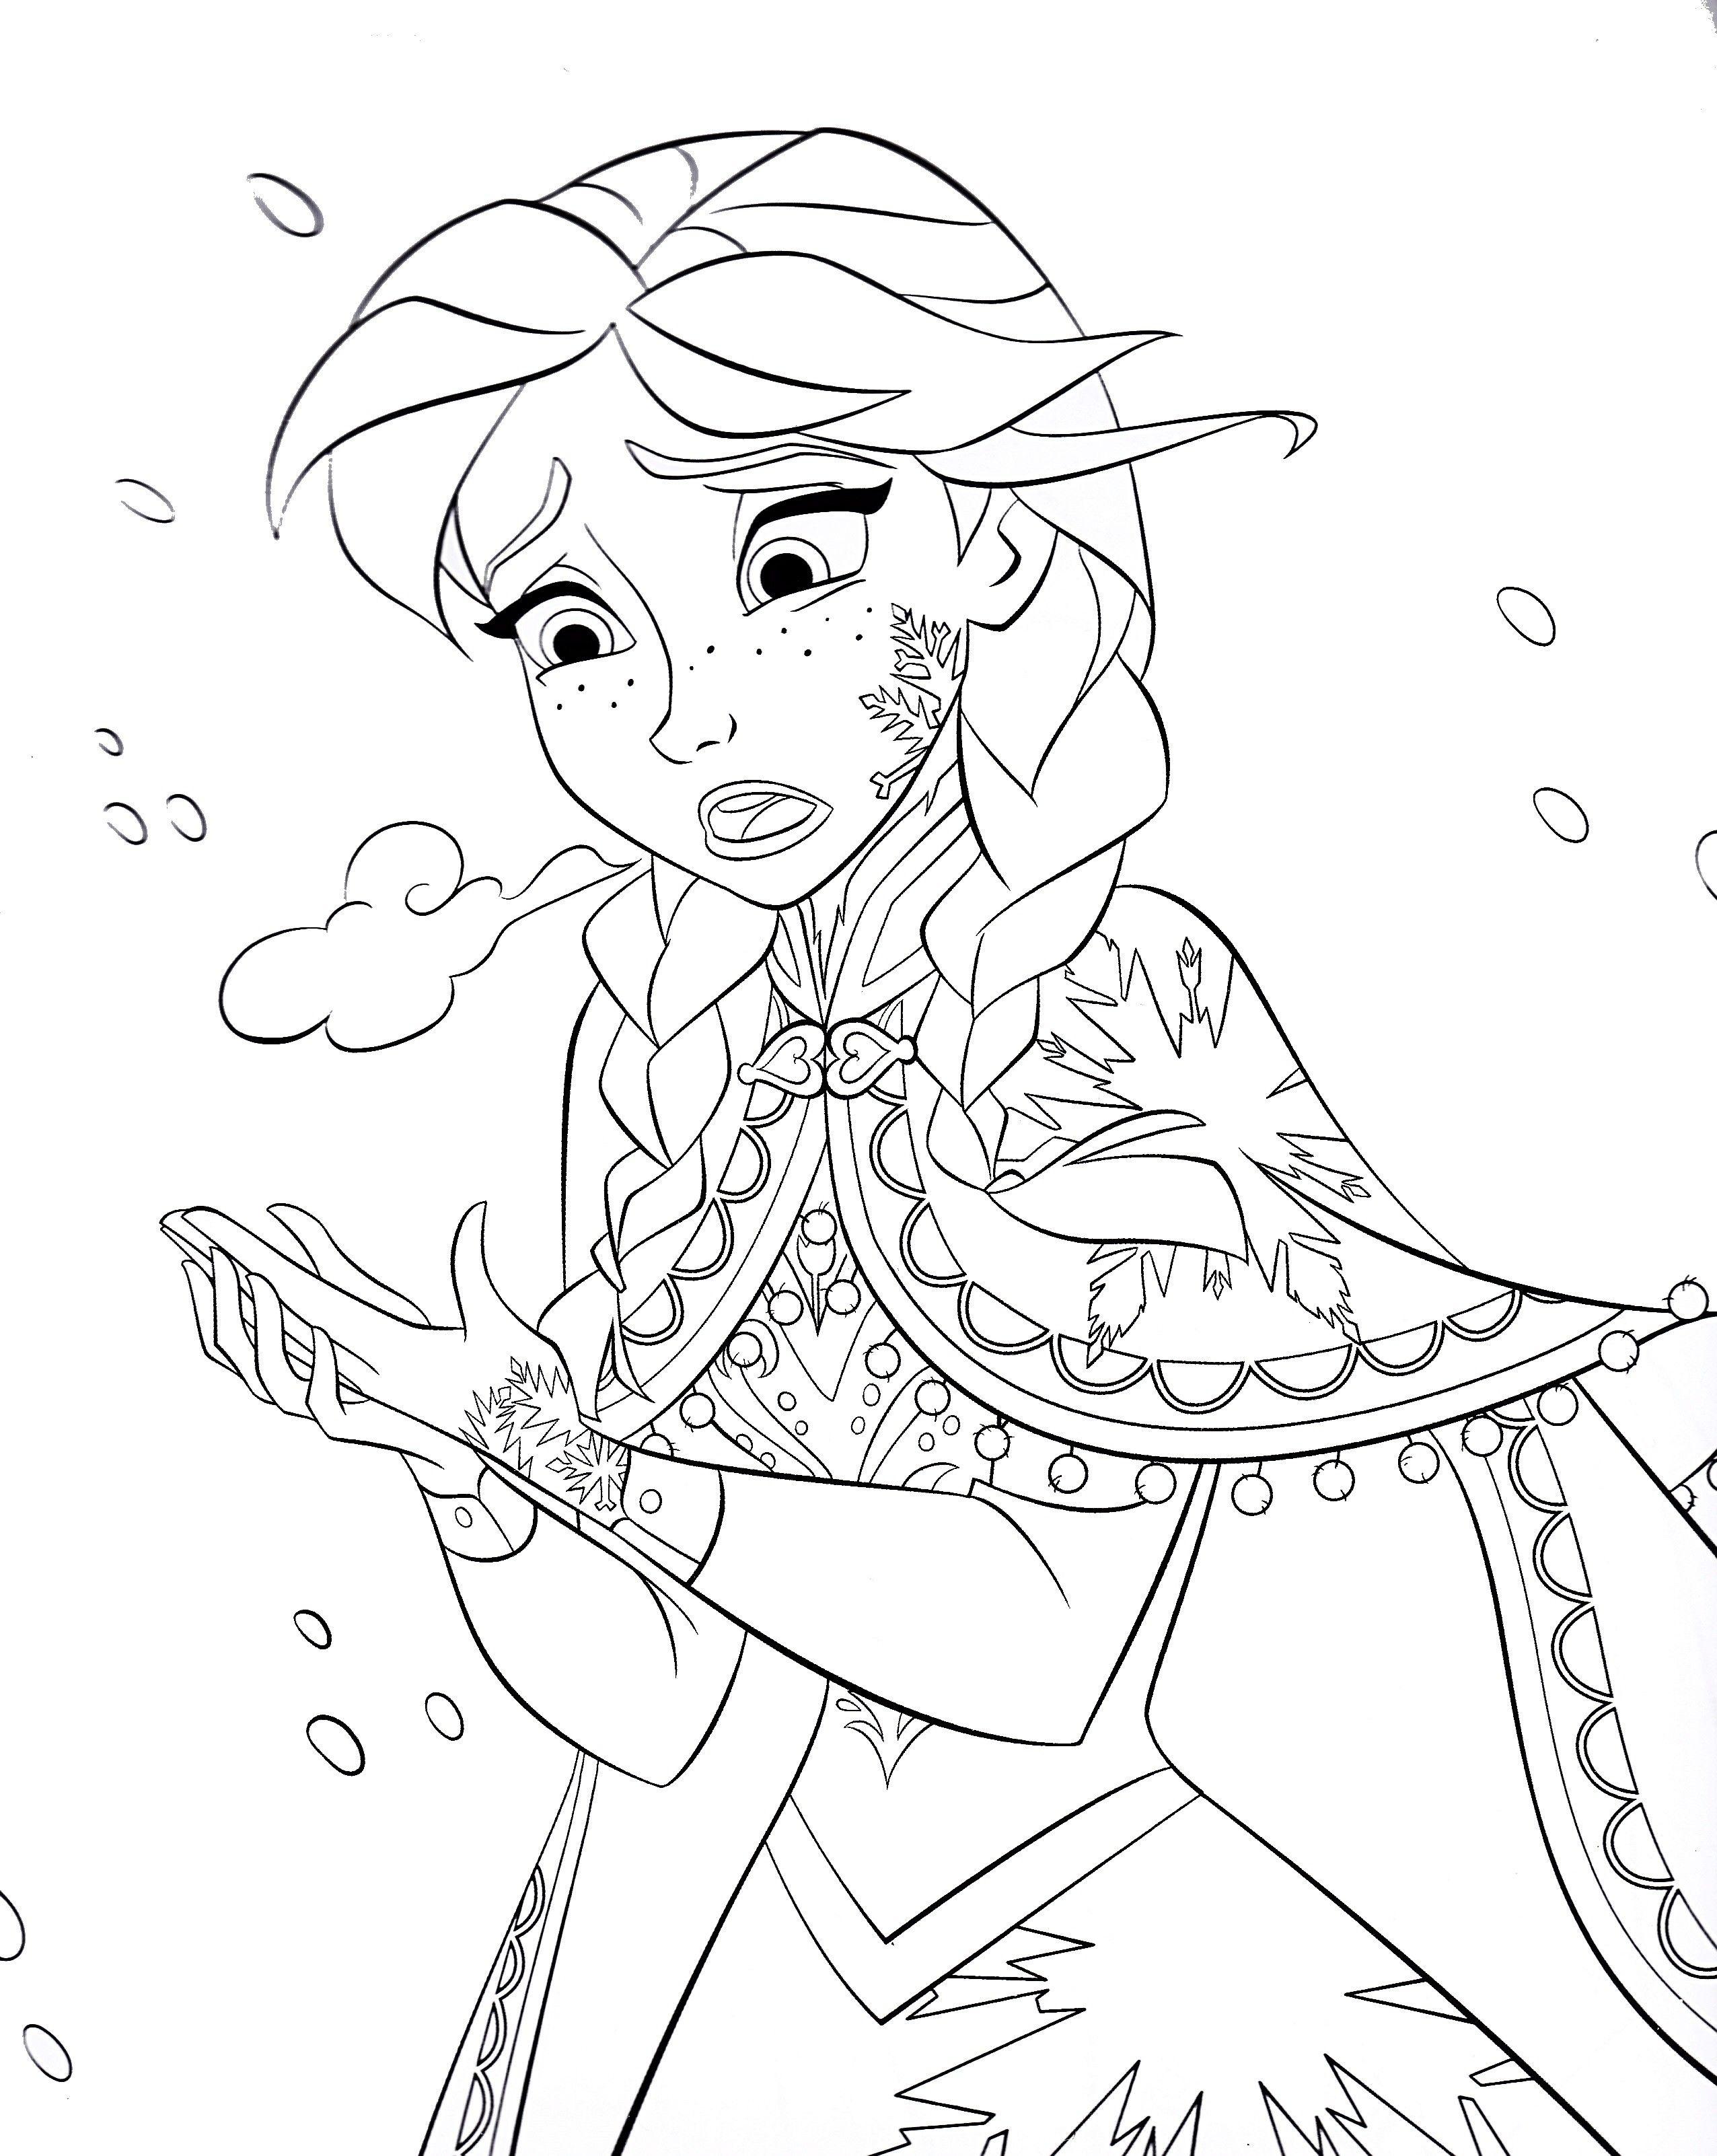 Disney Coloring Pages Anna Frozen Elsa coloring pages